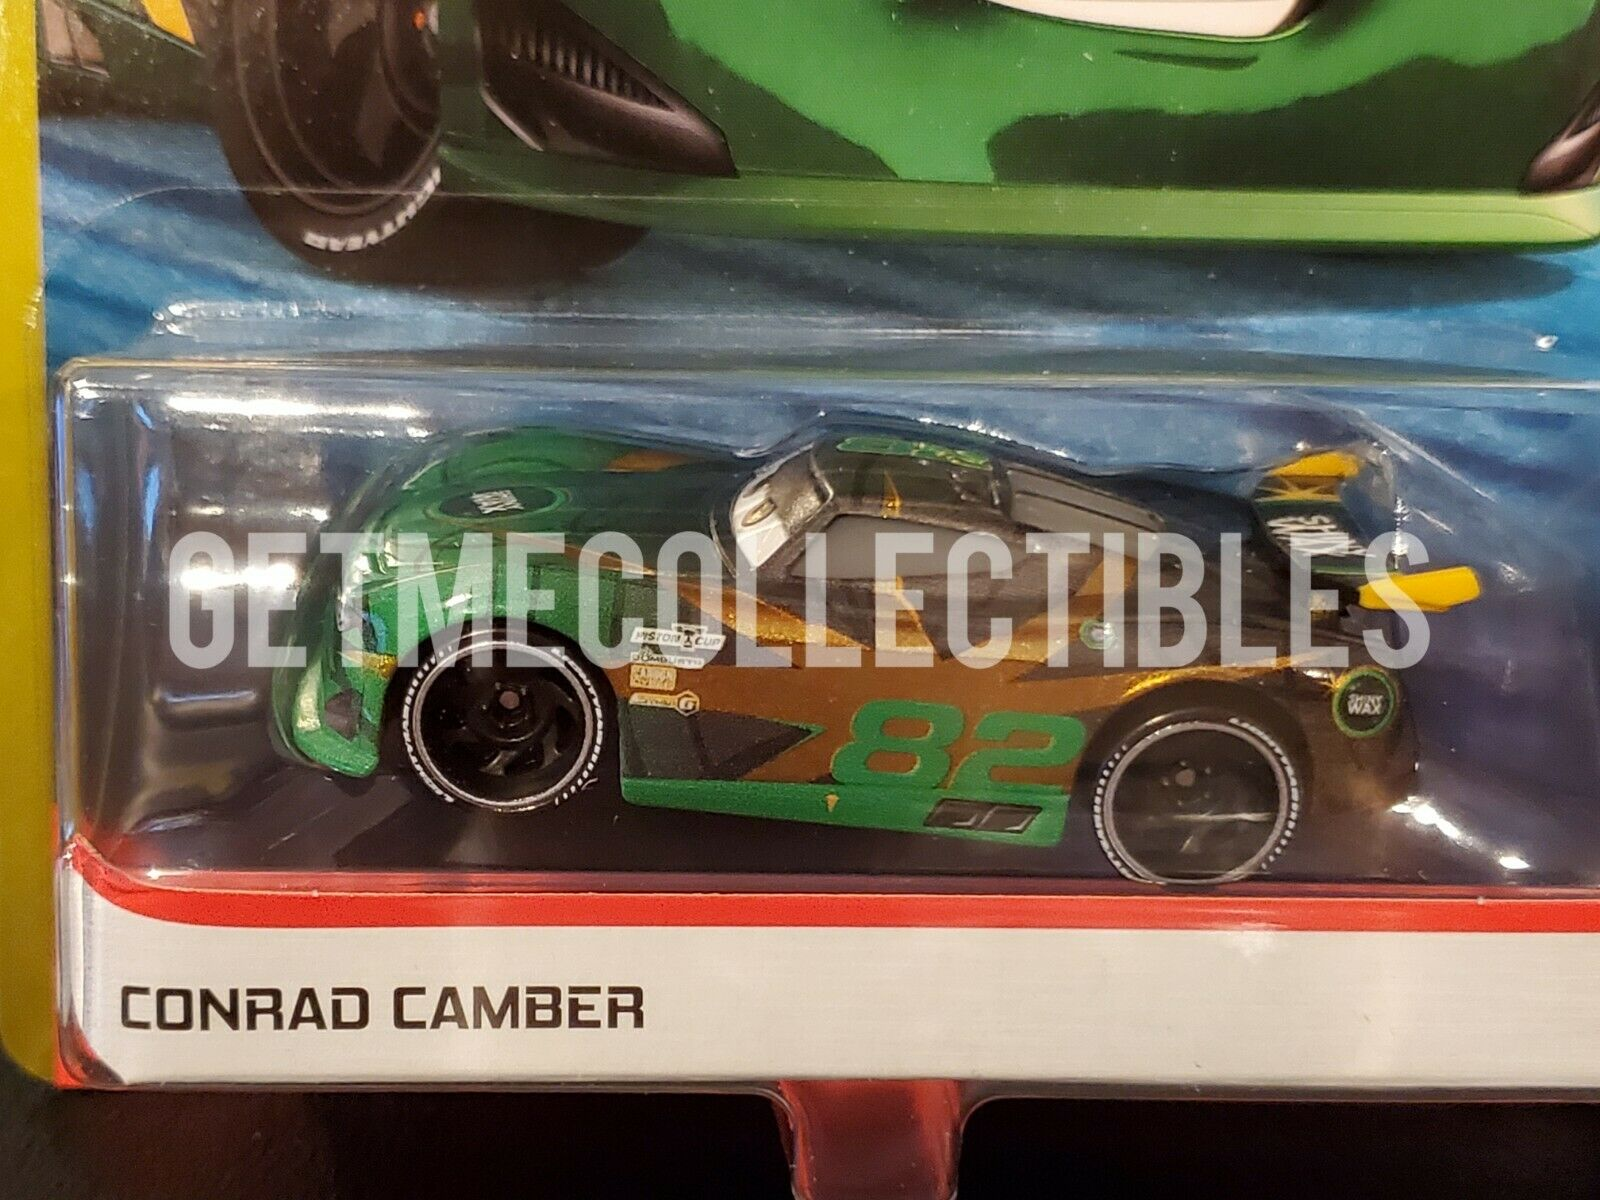 Disney PIXAR Cars 3 CONRAD CAMBER #82 * Shiny Wax Next Gen R